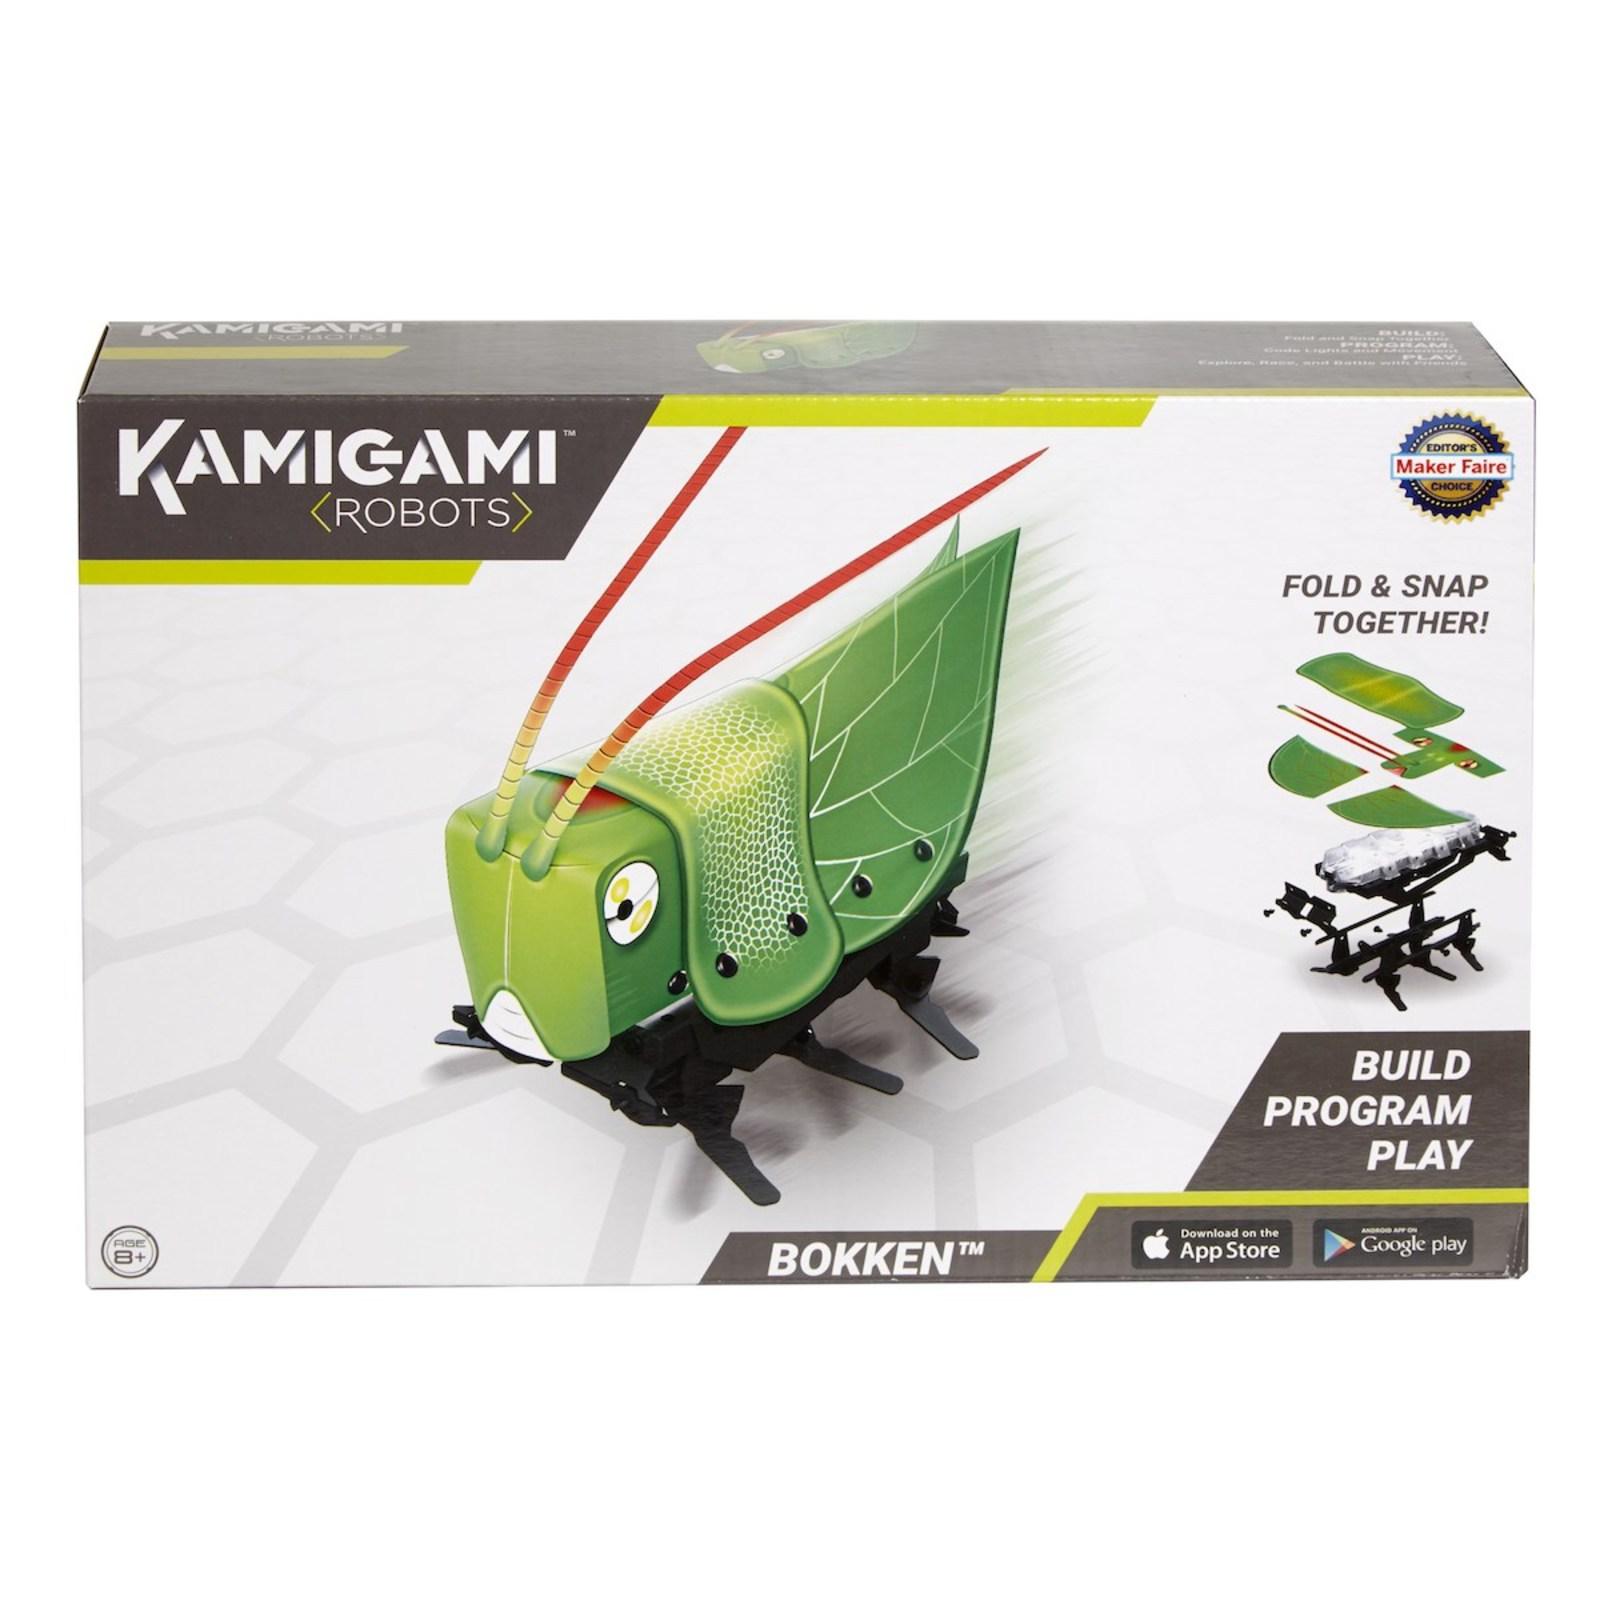 Meet Kamigami Mattel Launches Build It Yourself Robotics